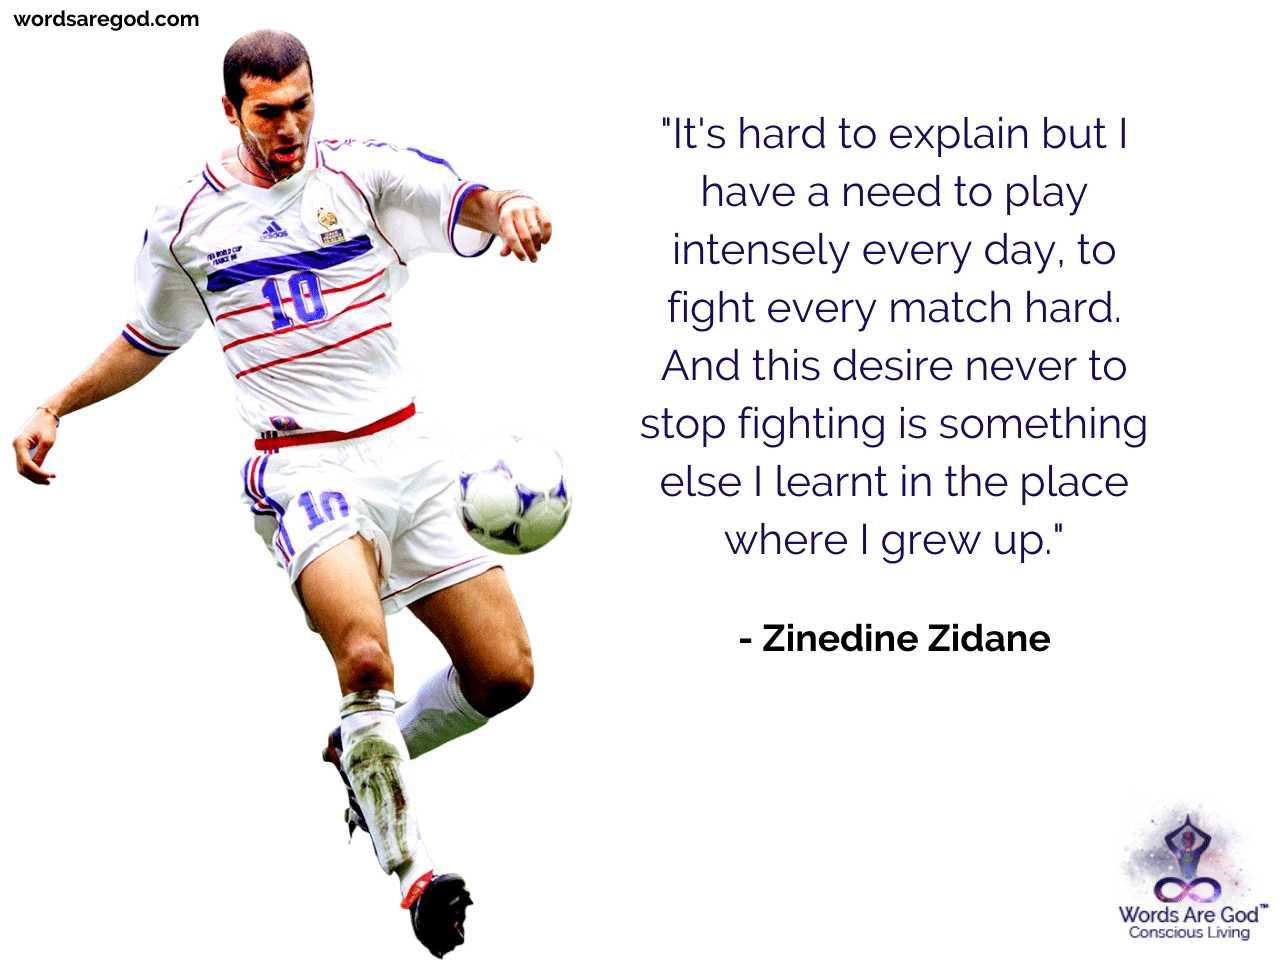 Zinedine Zidane Best Quote by Zinedine Zidane